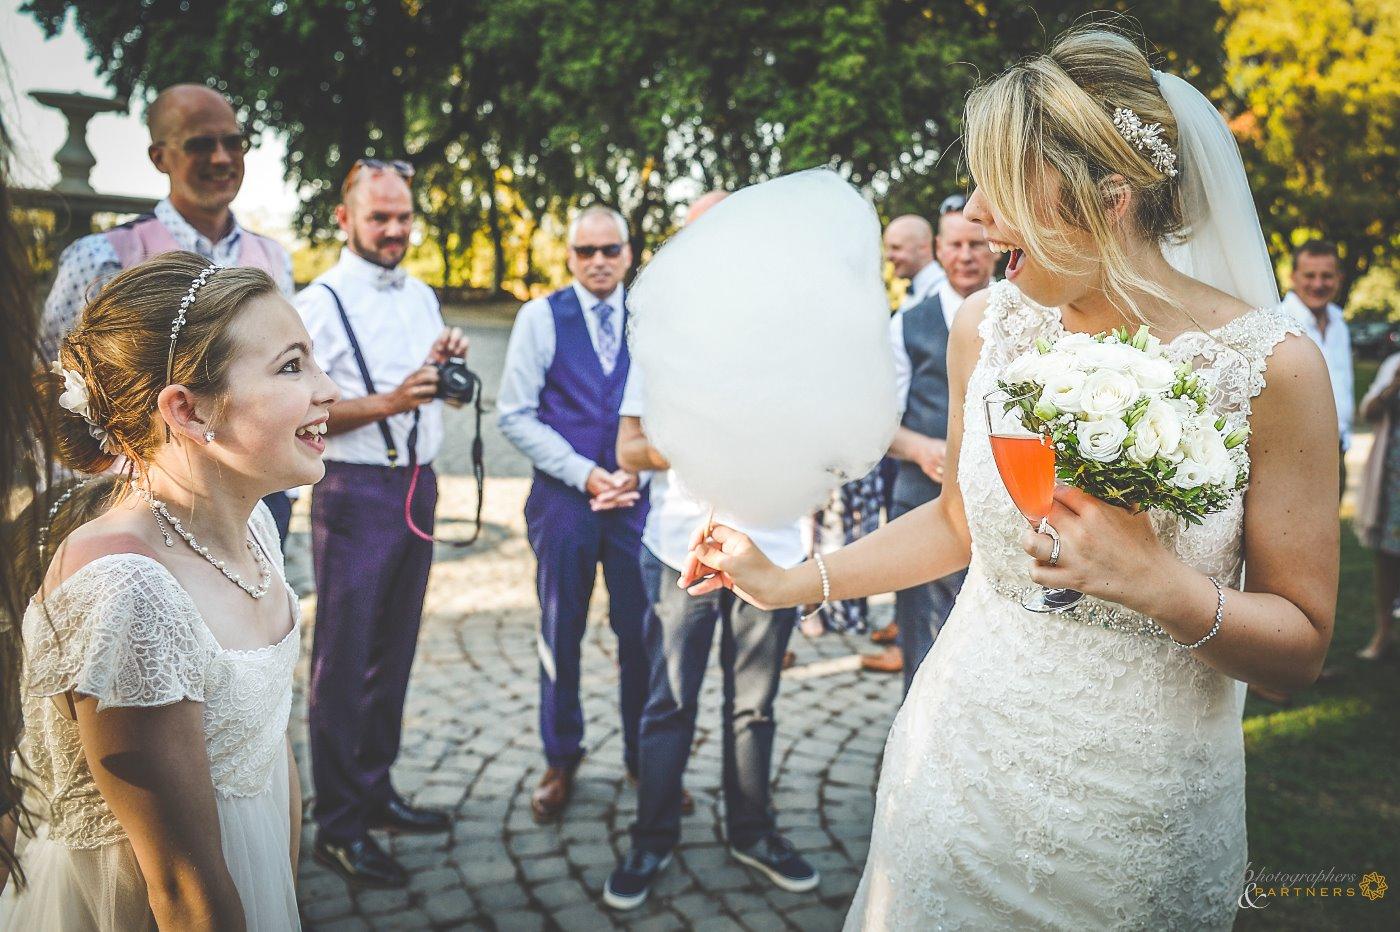 photography_weddings_villa_grazioli_15.jpg